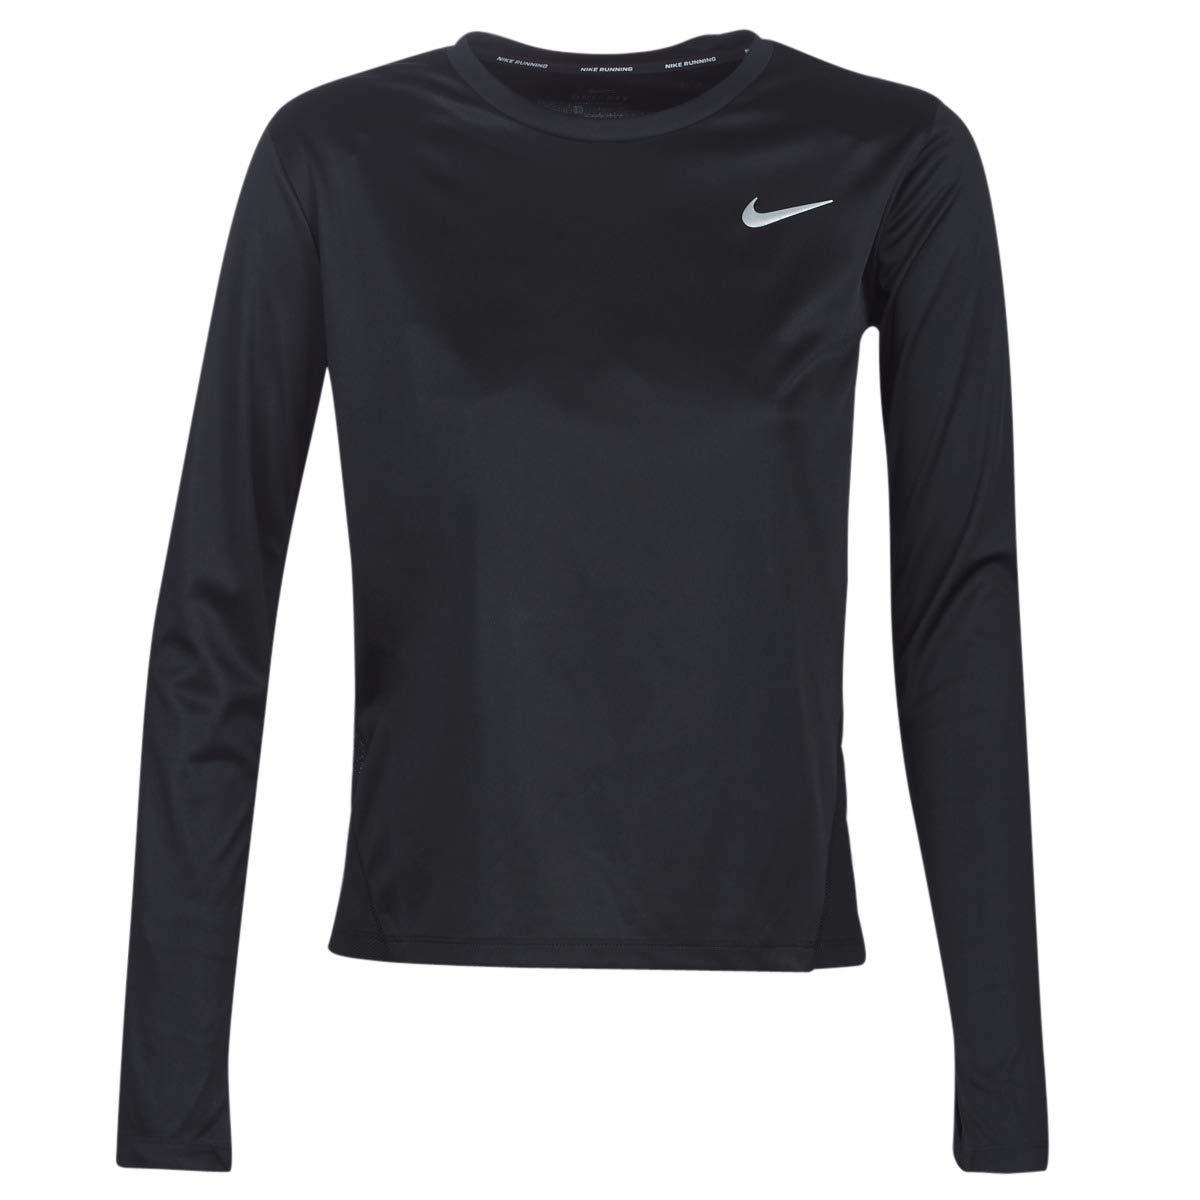 Miler Longsleeve Miler Nike Damen Longsleeve Nike Damen Damen Miler Nike PkOn0X8w